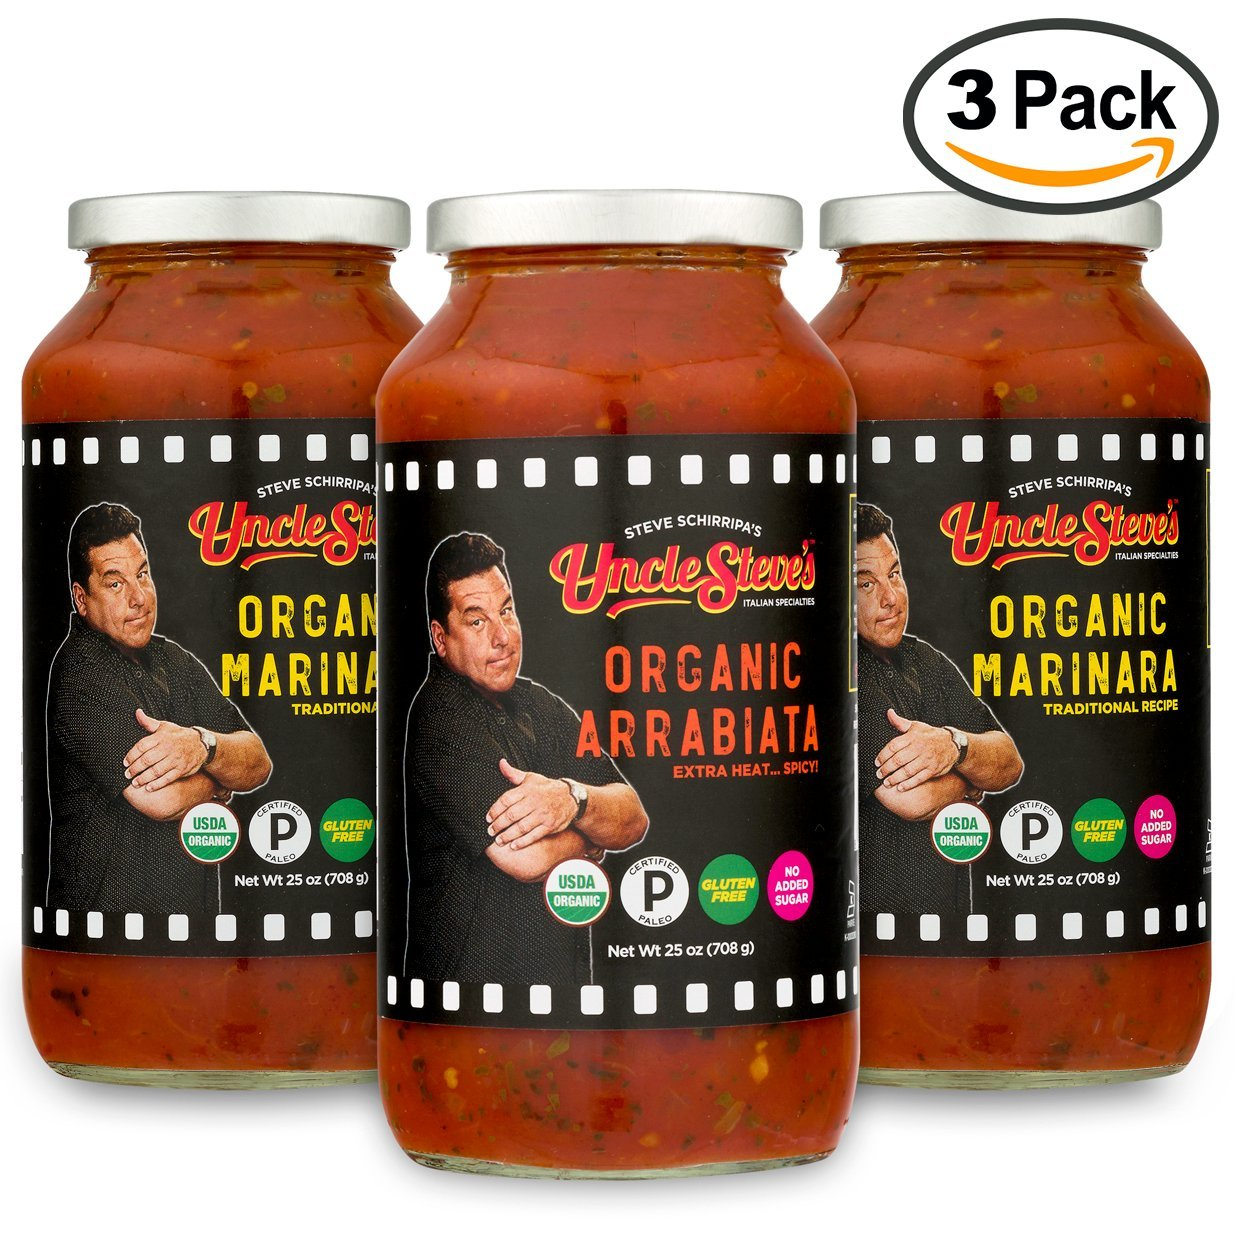 Tomato Sauce by Uncle Steve's - (2 Marinara 1 Arrabiata) for Spaghetti, Pasta or Pizza